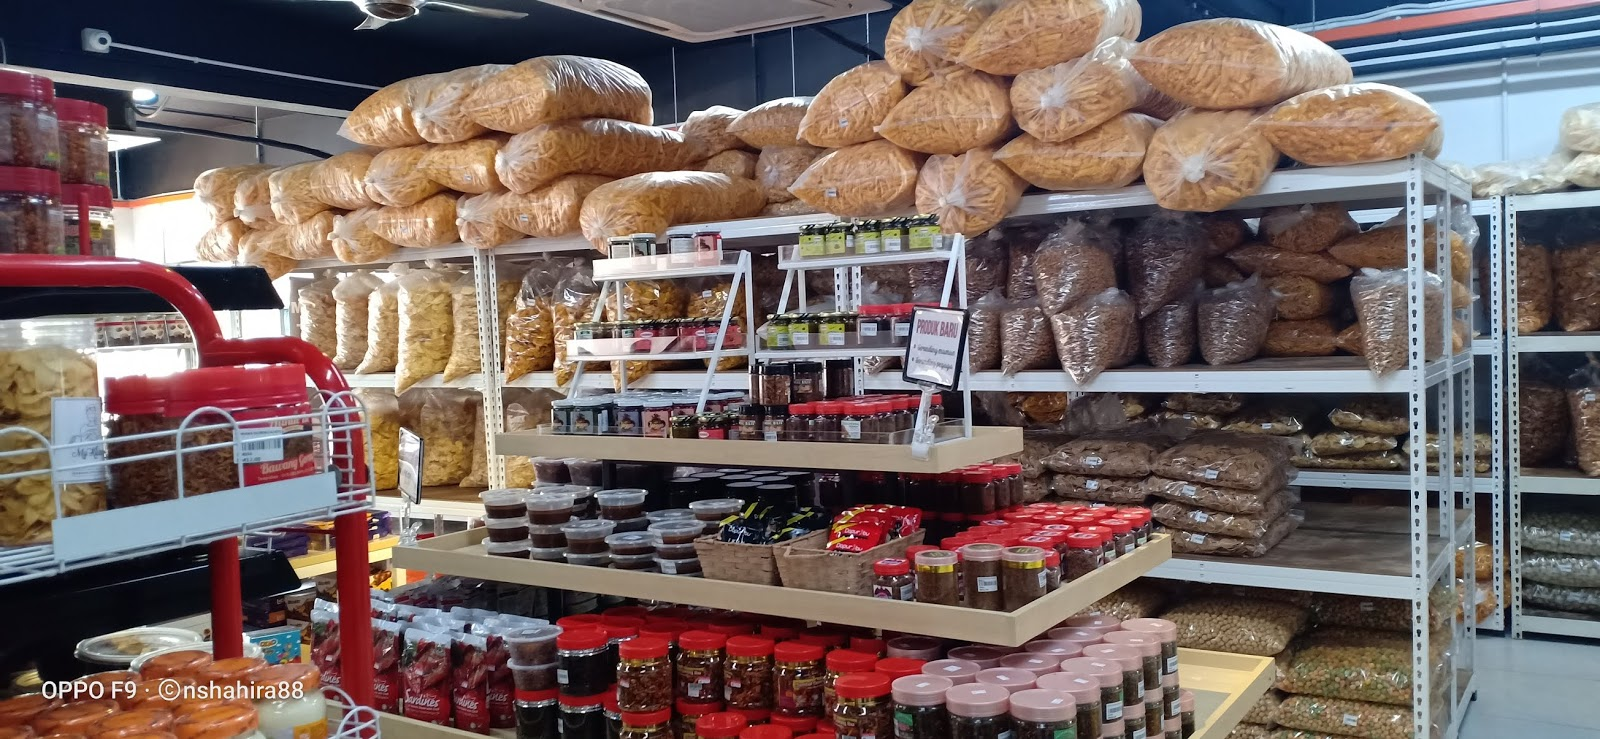 Kedai Kerepek Paroi Seremban Jual Bermacam Produk Bumiputera